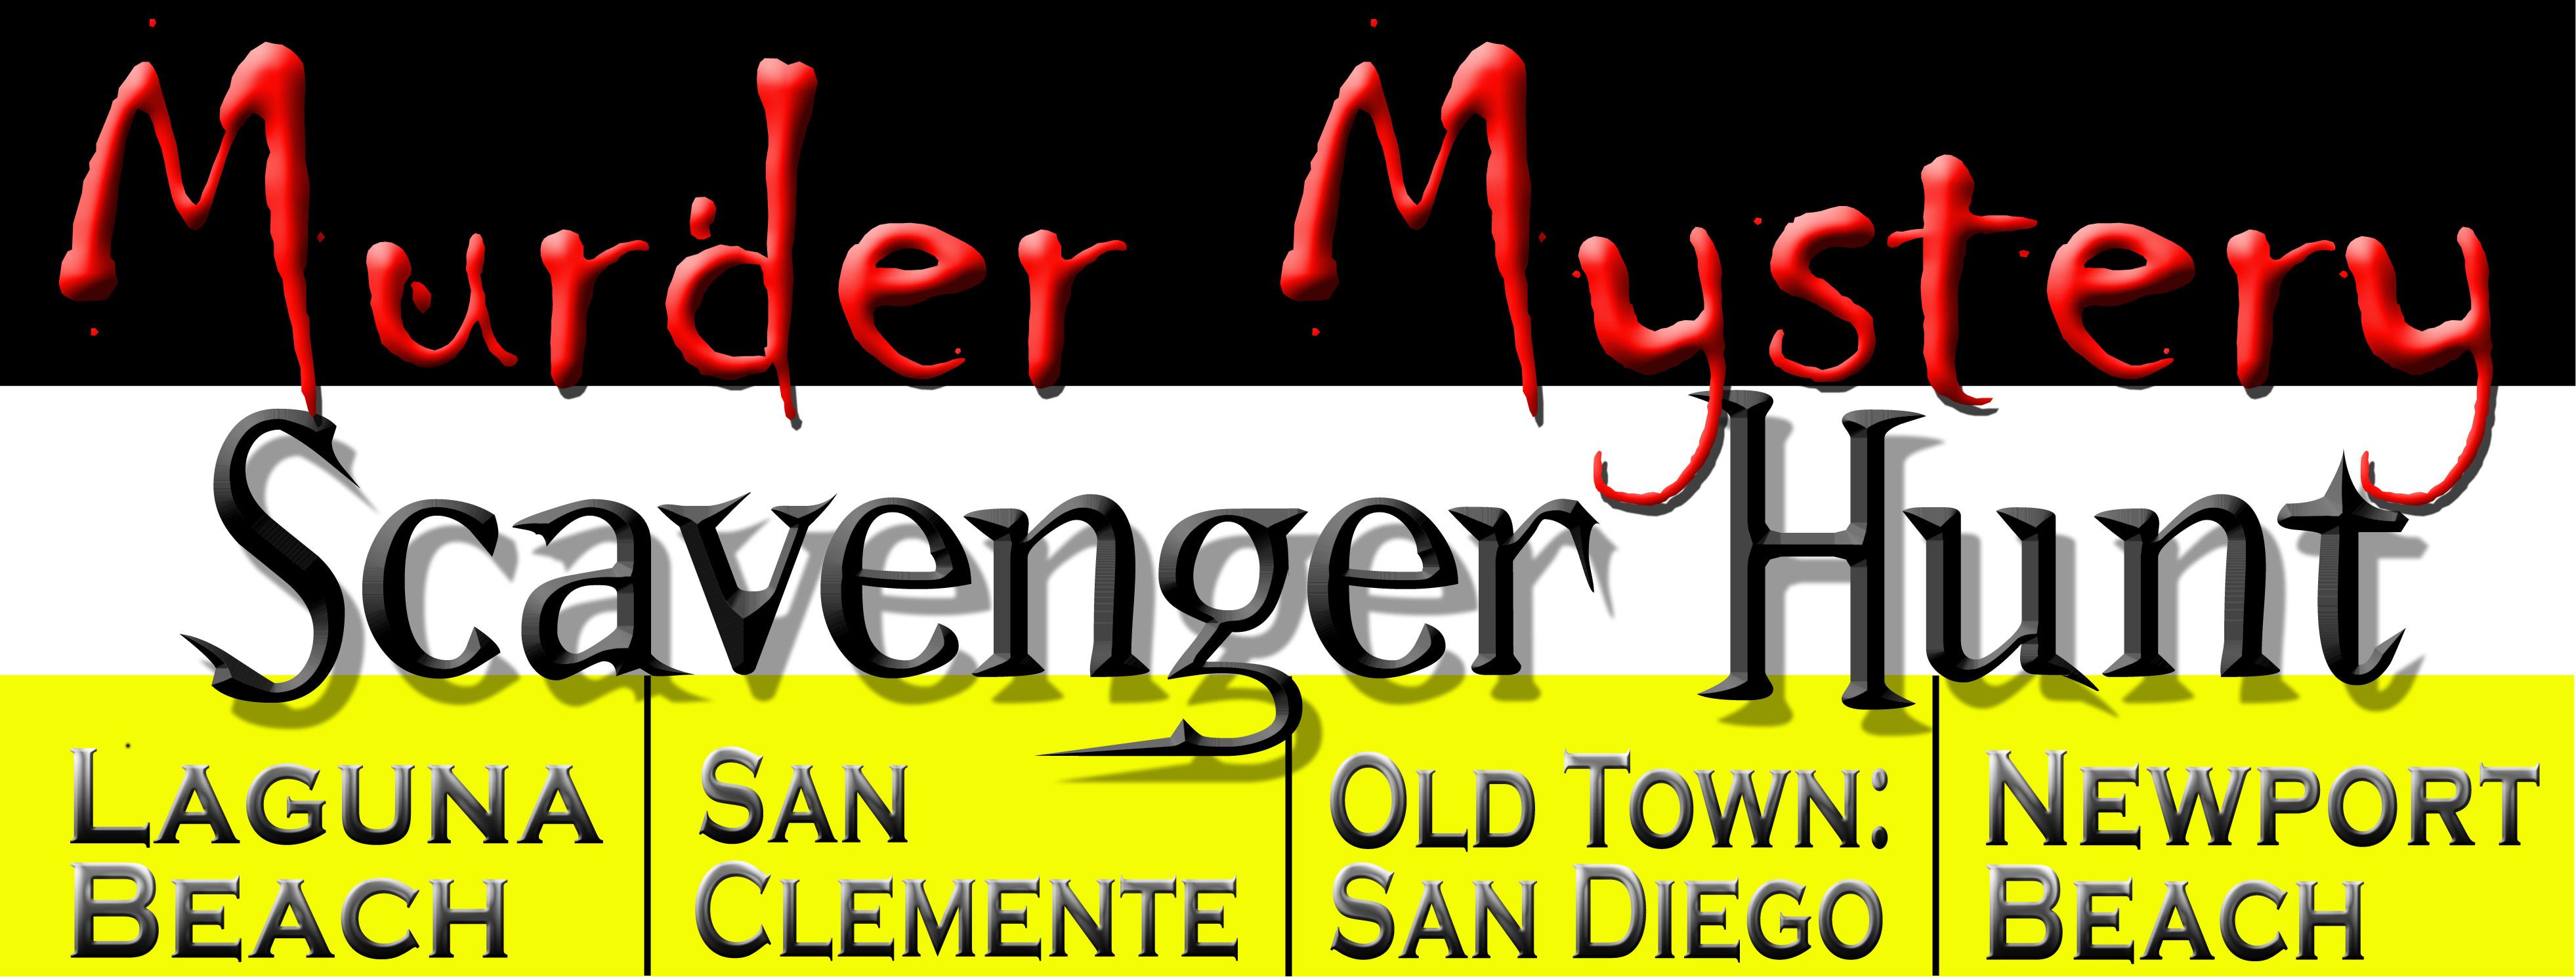 A Murder Mystery Scavenger Hunt